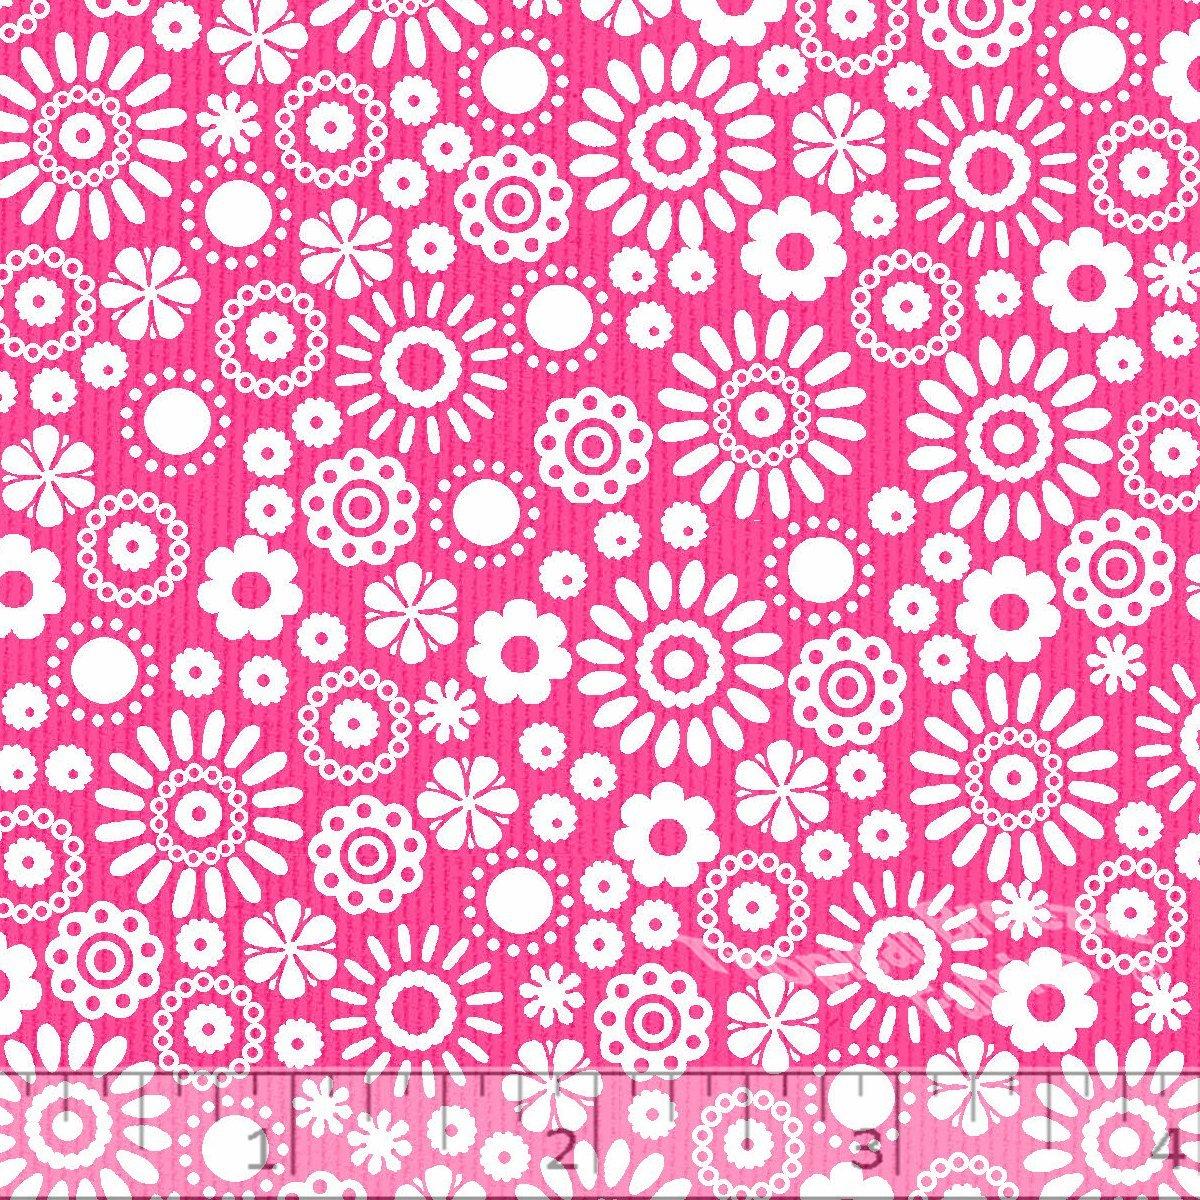 Hot Pink Flower Power Dobby Pique